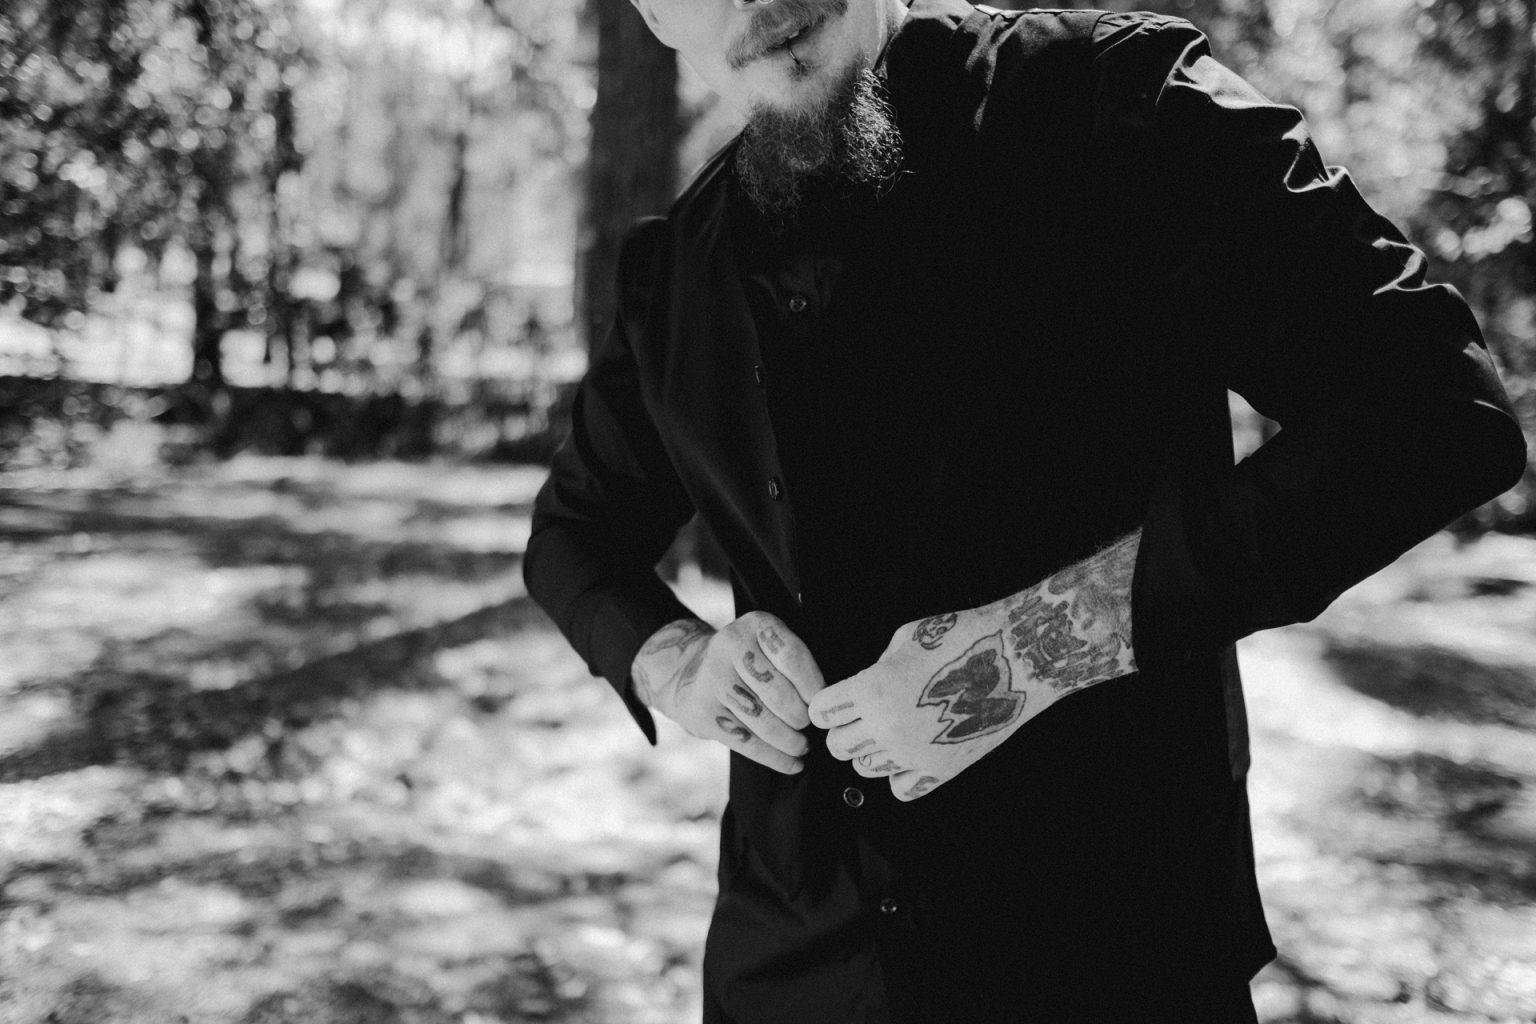 tattooed man doing up shirt